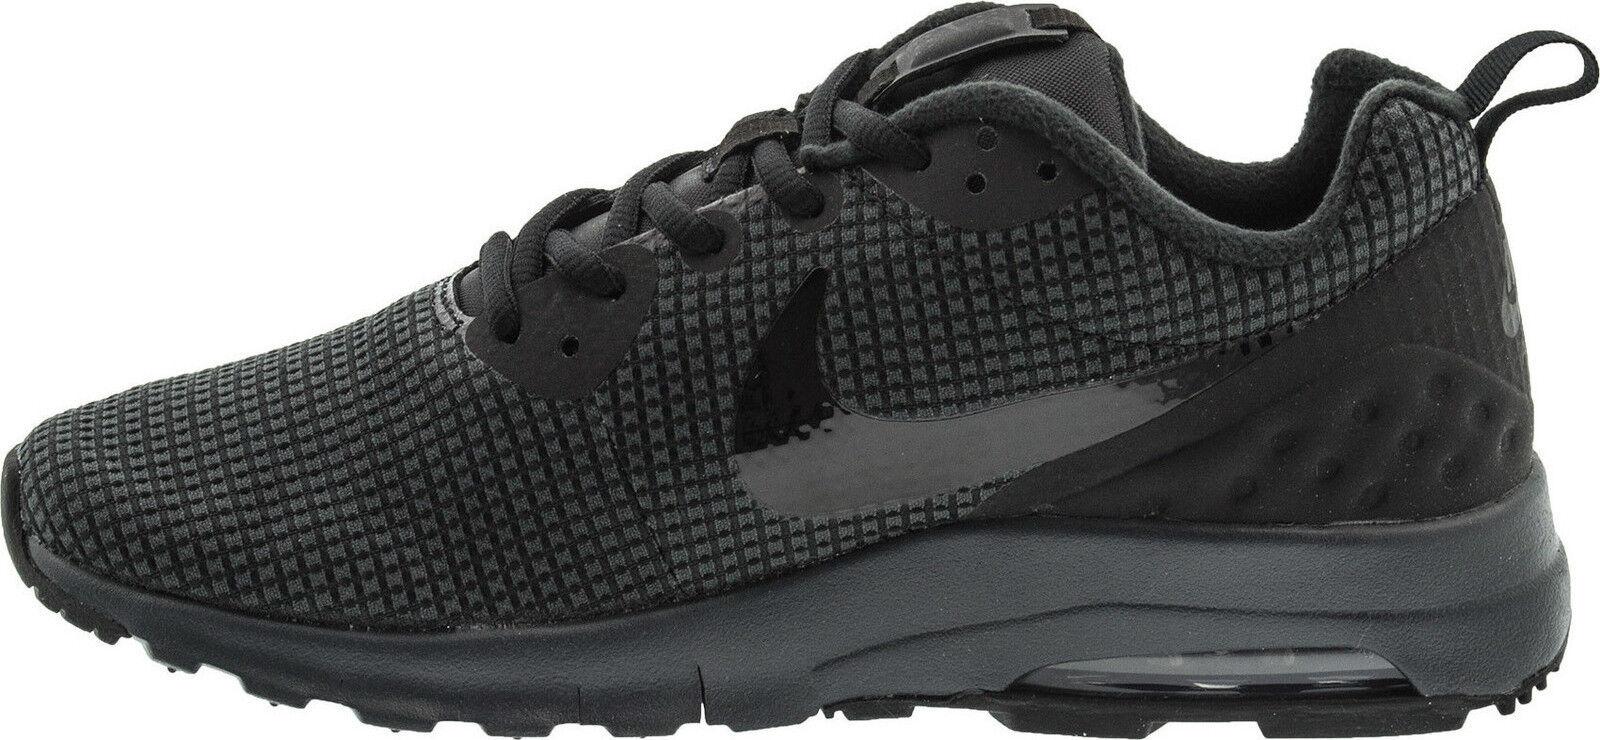 Nike De Mujer Nike Air Max Motion Motion Motion LW se 844895-005 Negro Talla 6.5  wholesape barato